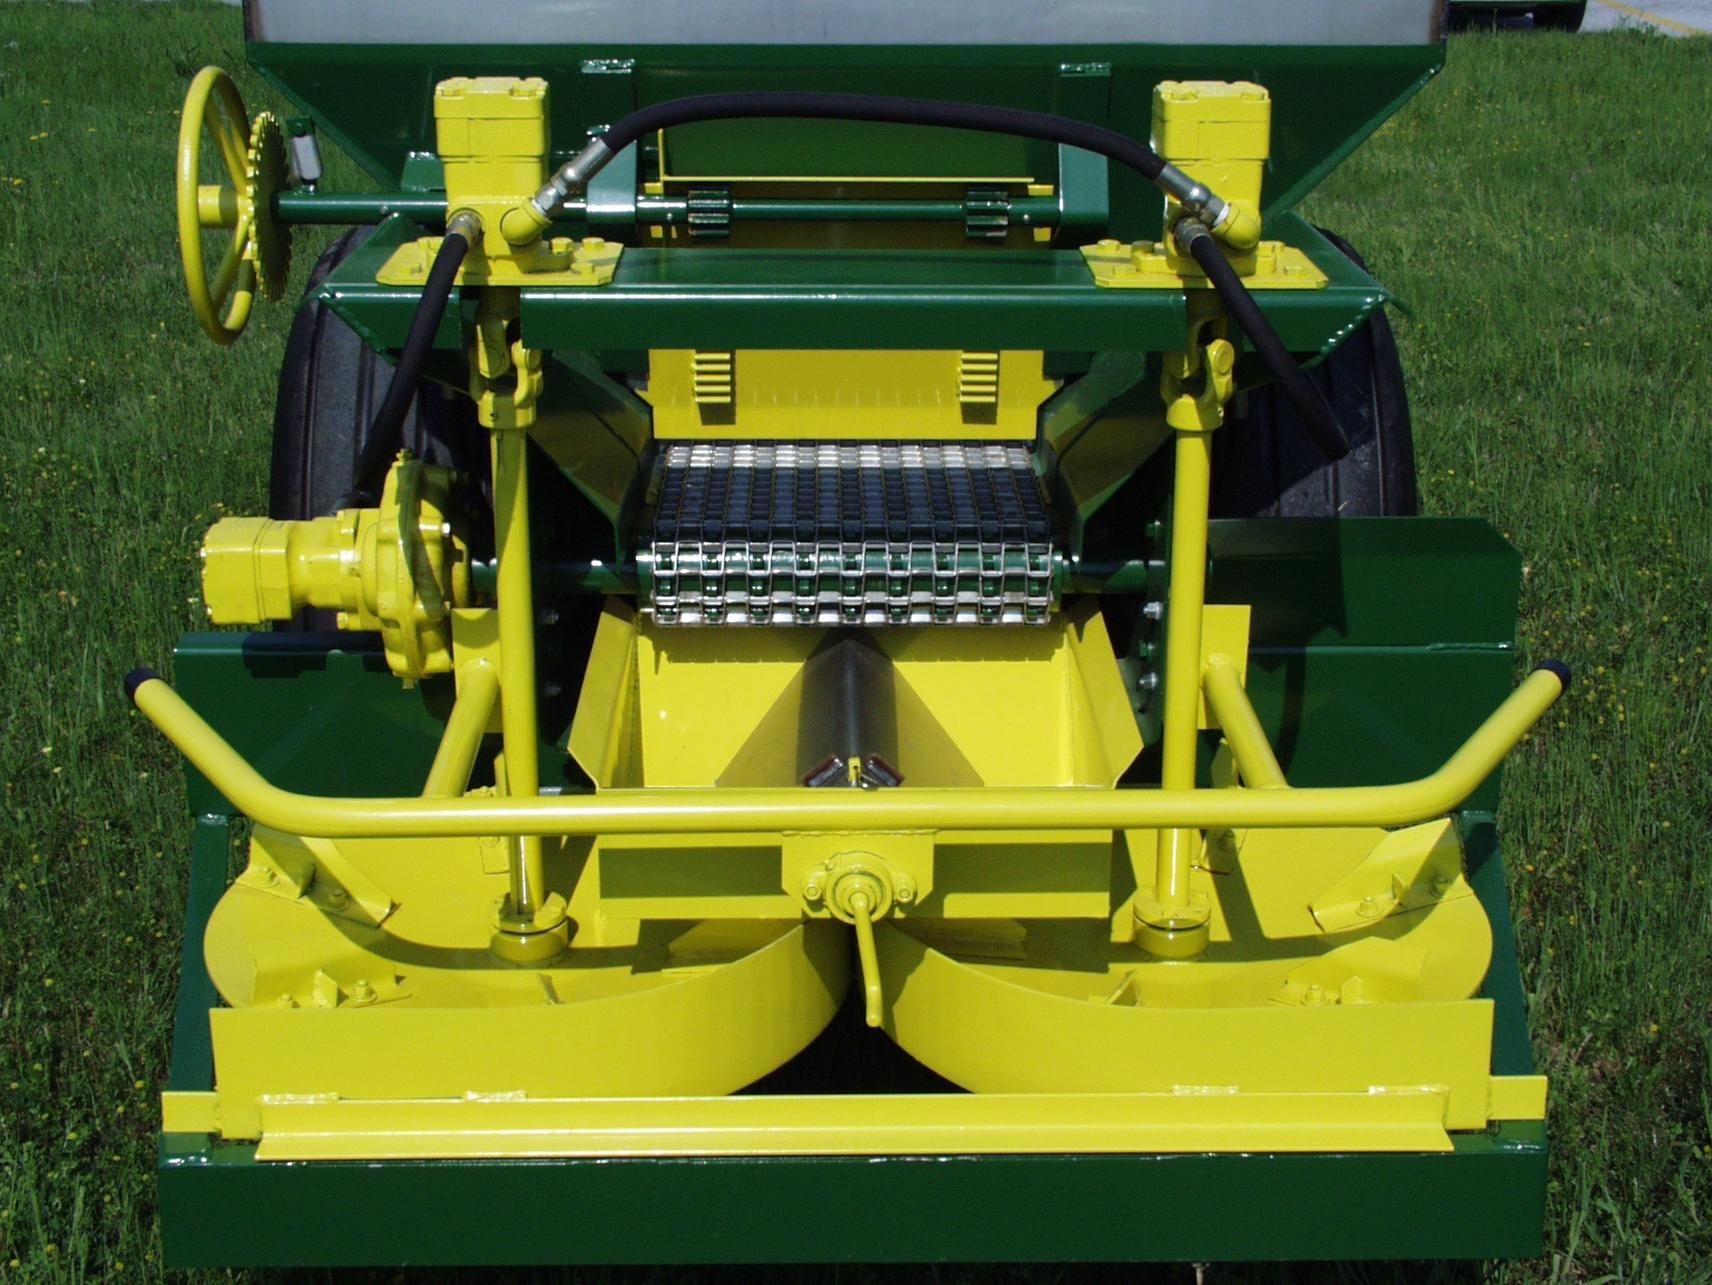 BBI Cricket Vineyard Spinner and Conveyor System